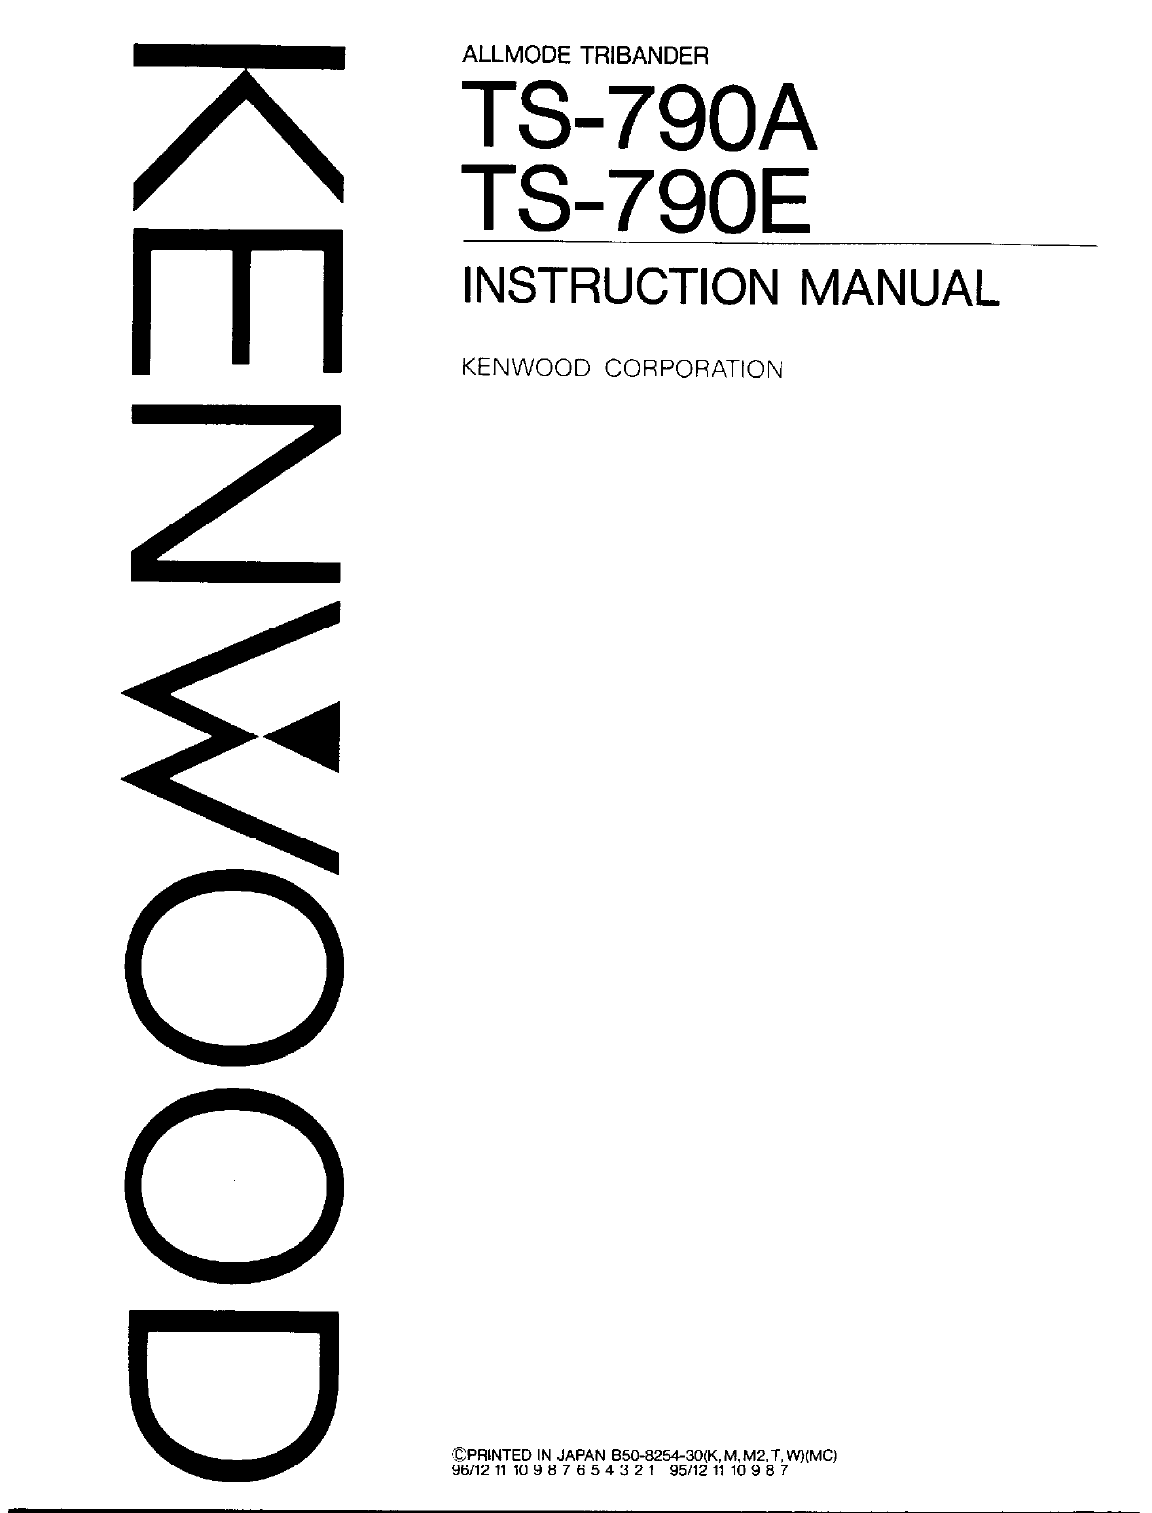 Kenwood TS790 User Manual TS 790